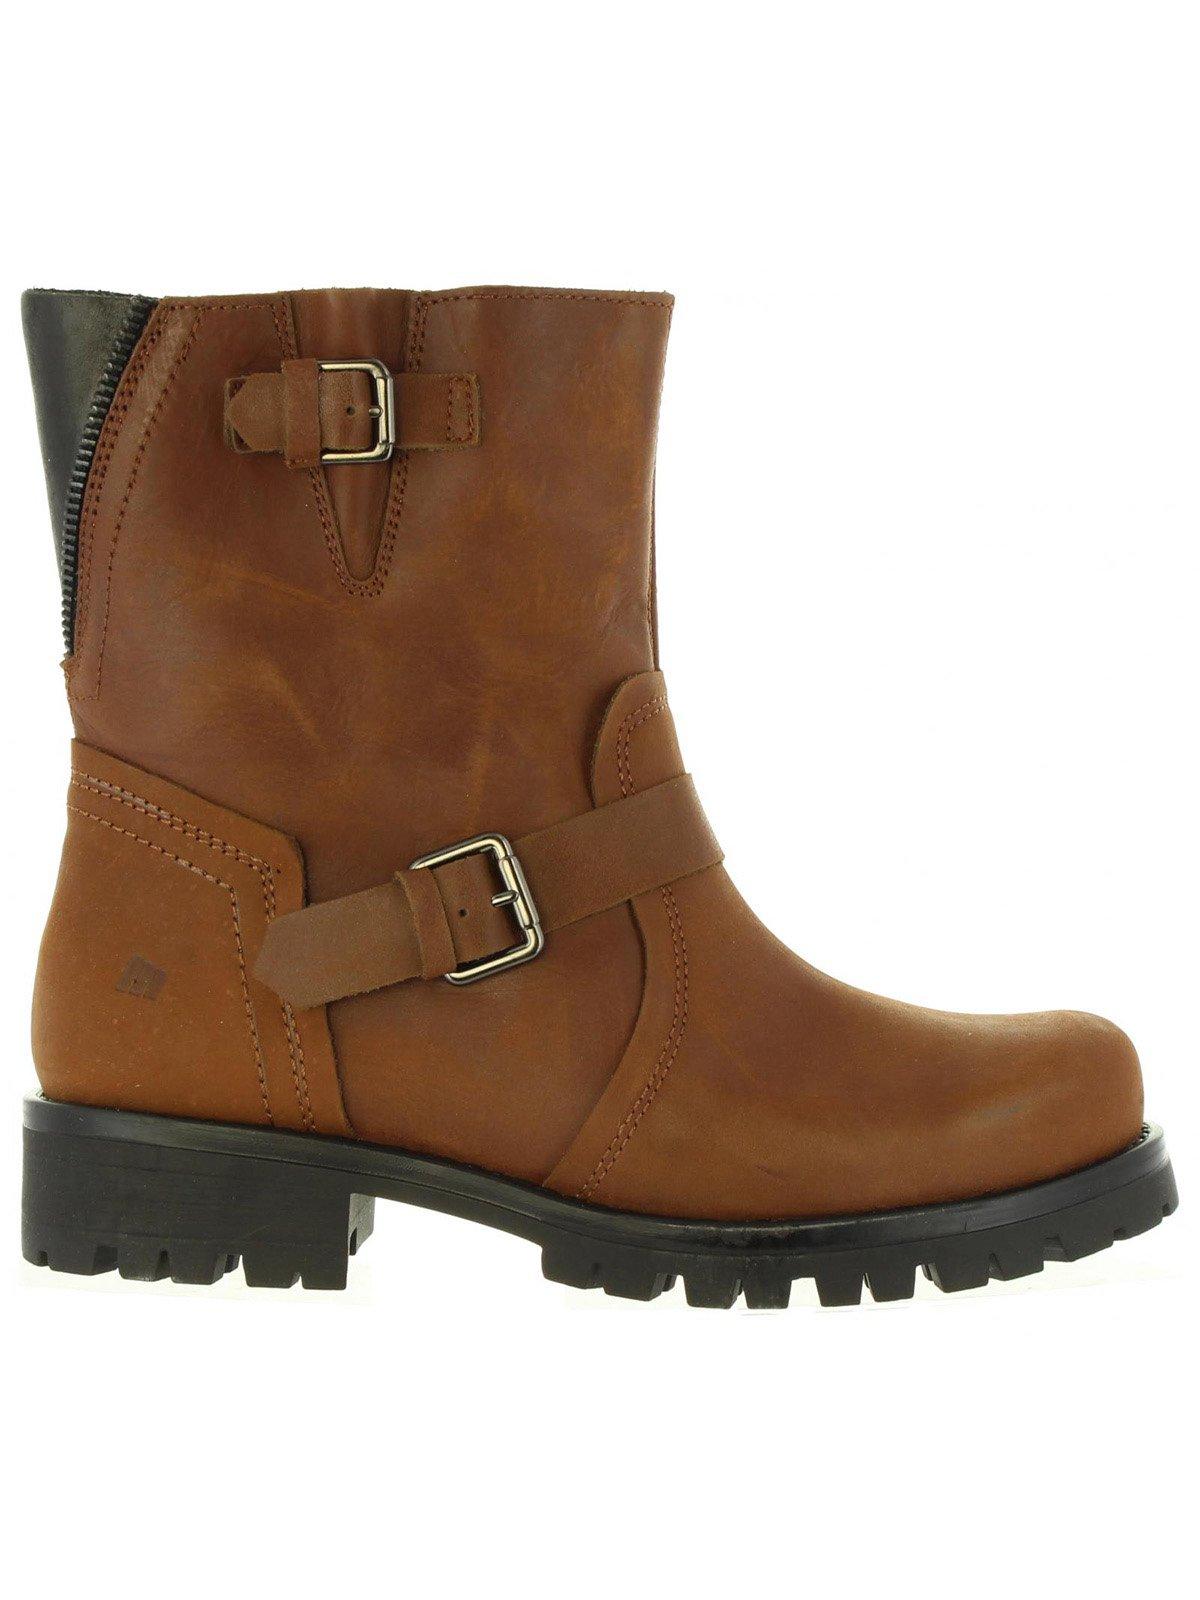 Ботинки коричневые   3619748